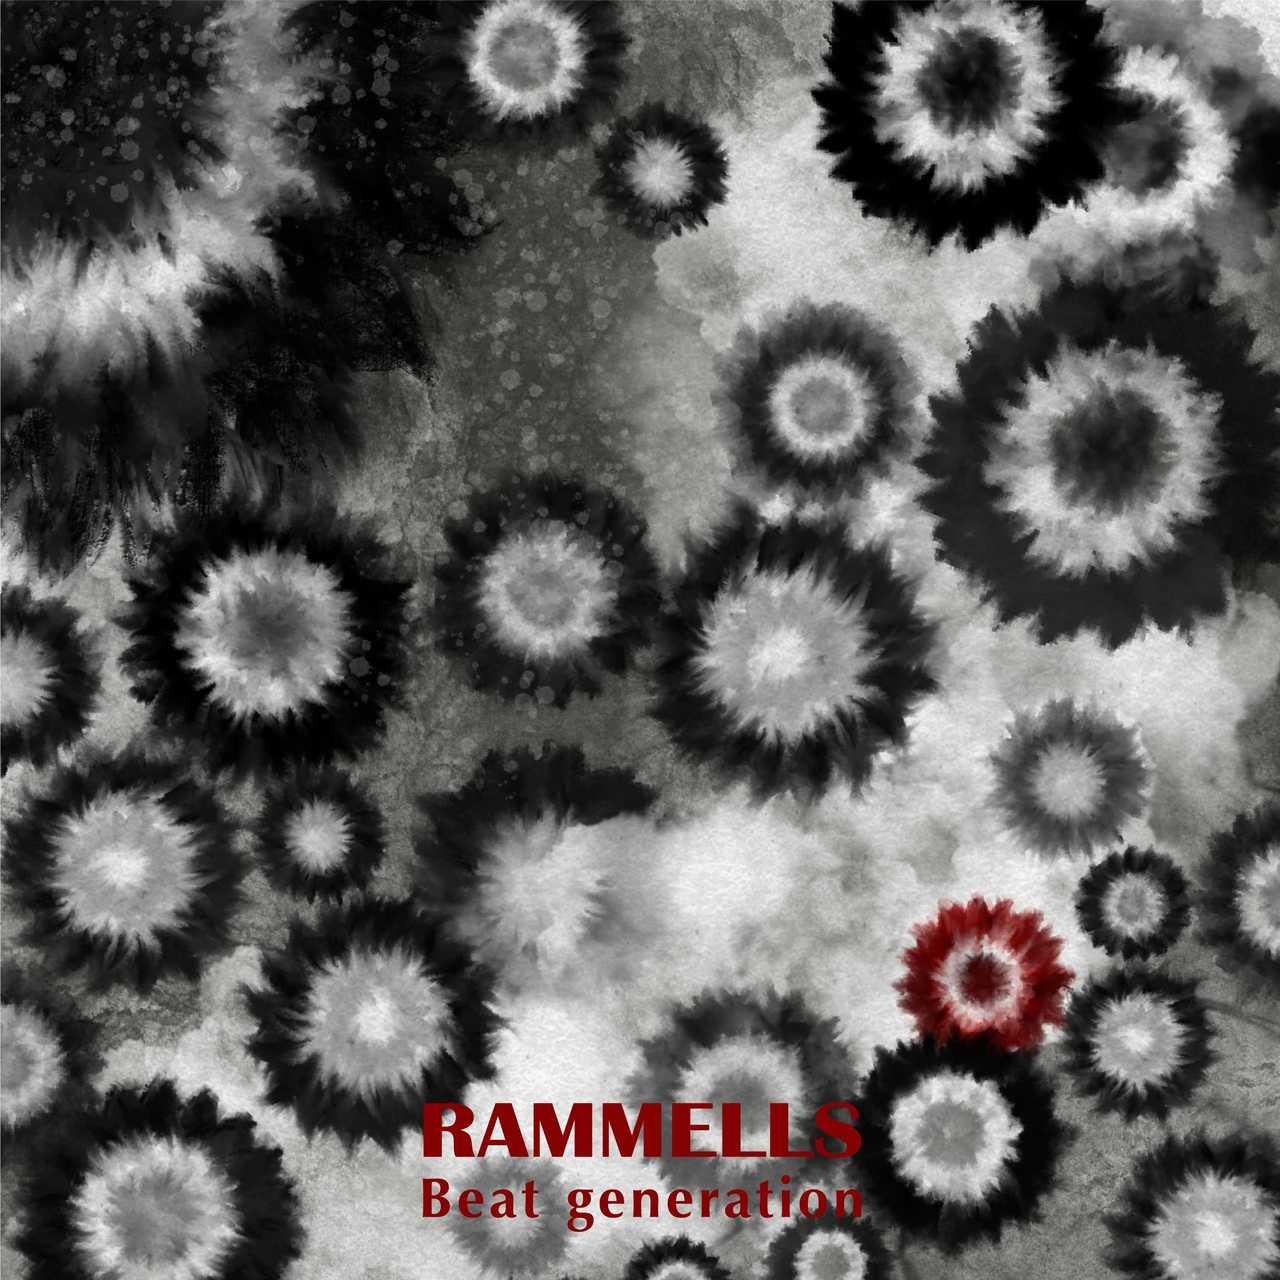 RAMMELLS 2ndミニアルバム「Beat generation」リリース決定